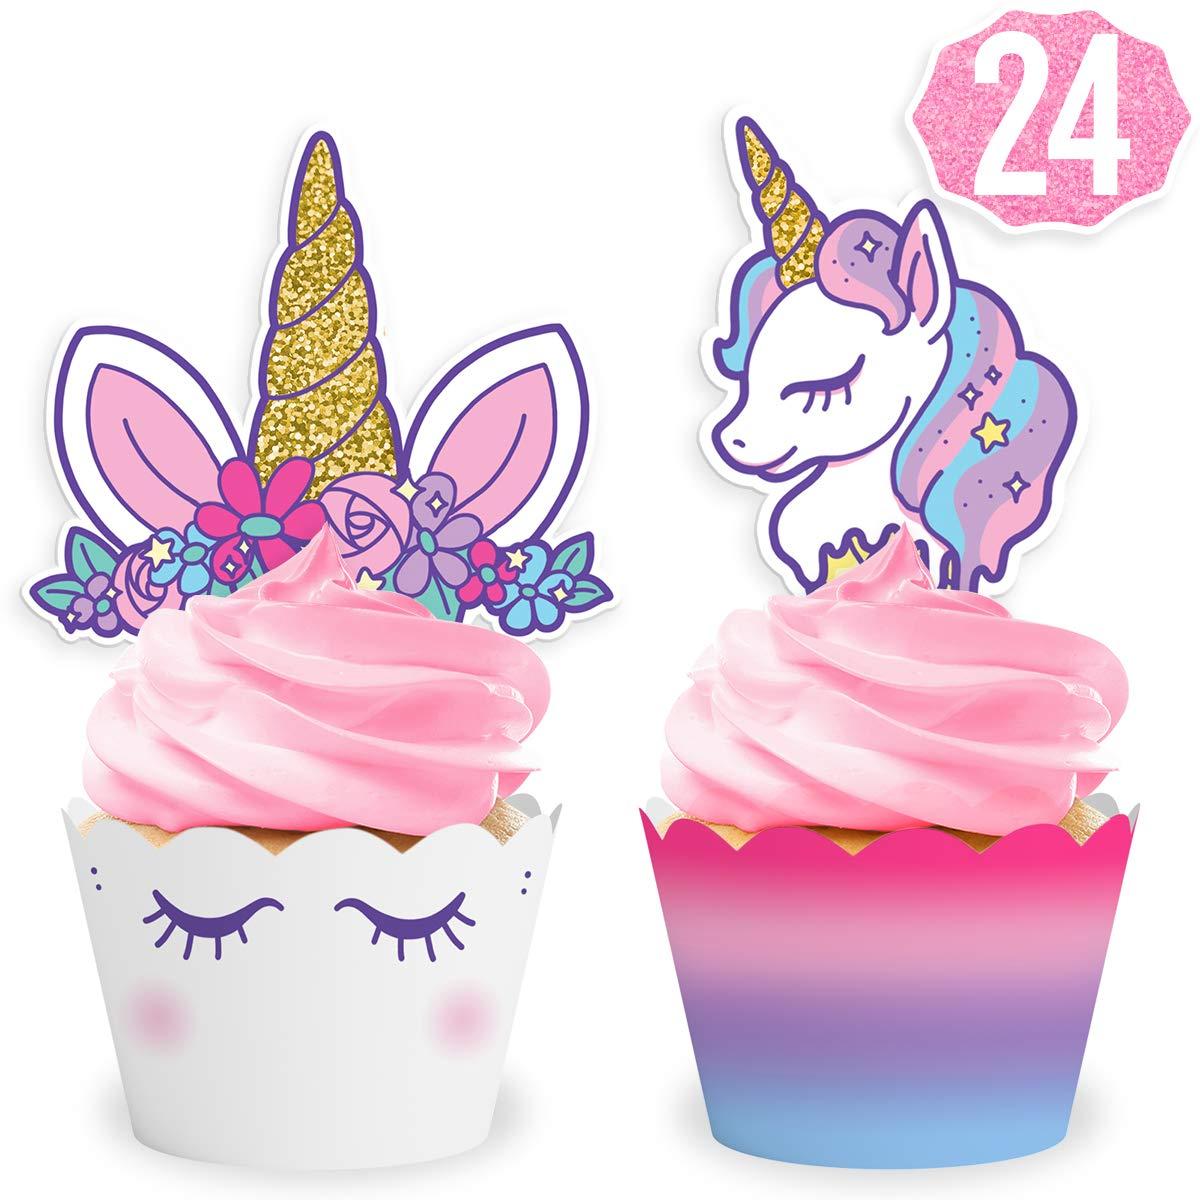 xo, Fetti Unicorn Cupcake Toppers + Wrappers   Unicorn Party Supplies + Unicorn Birthday Cupcake Decorations - Set of 24